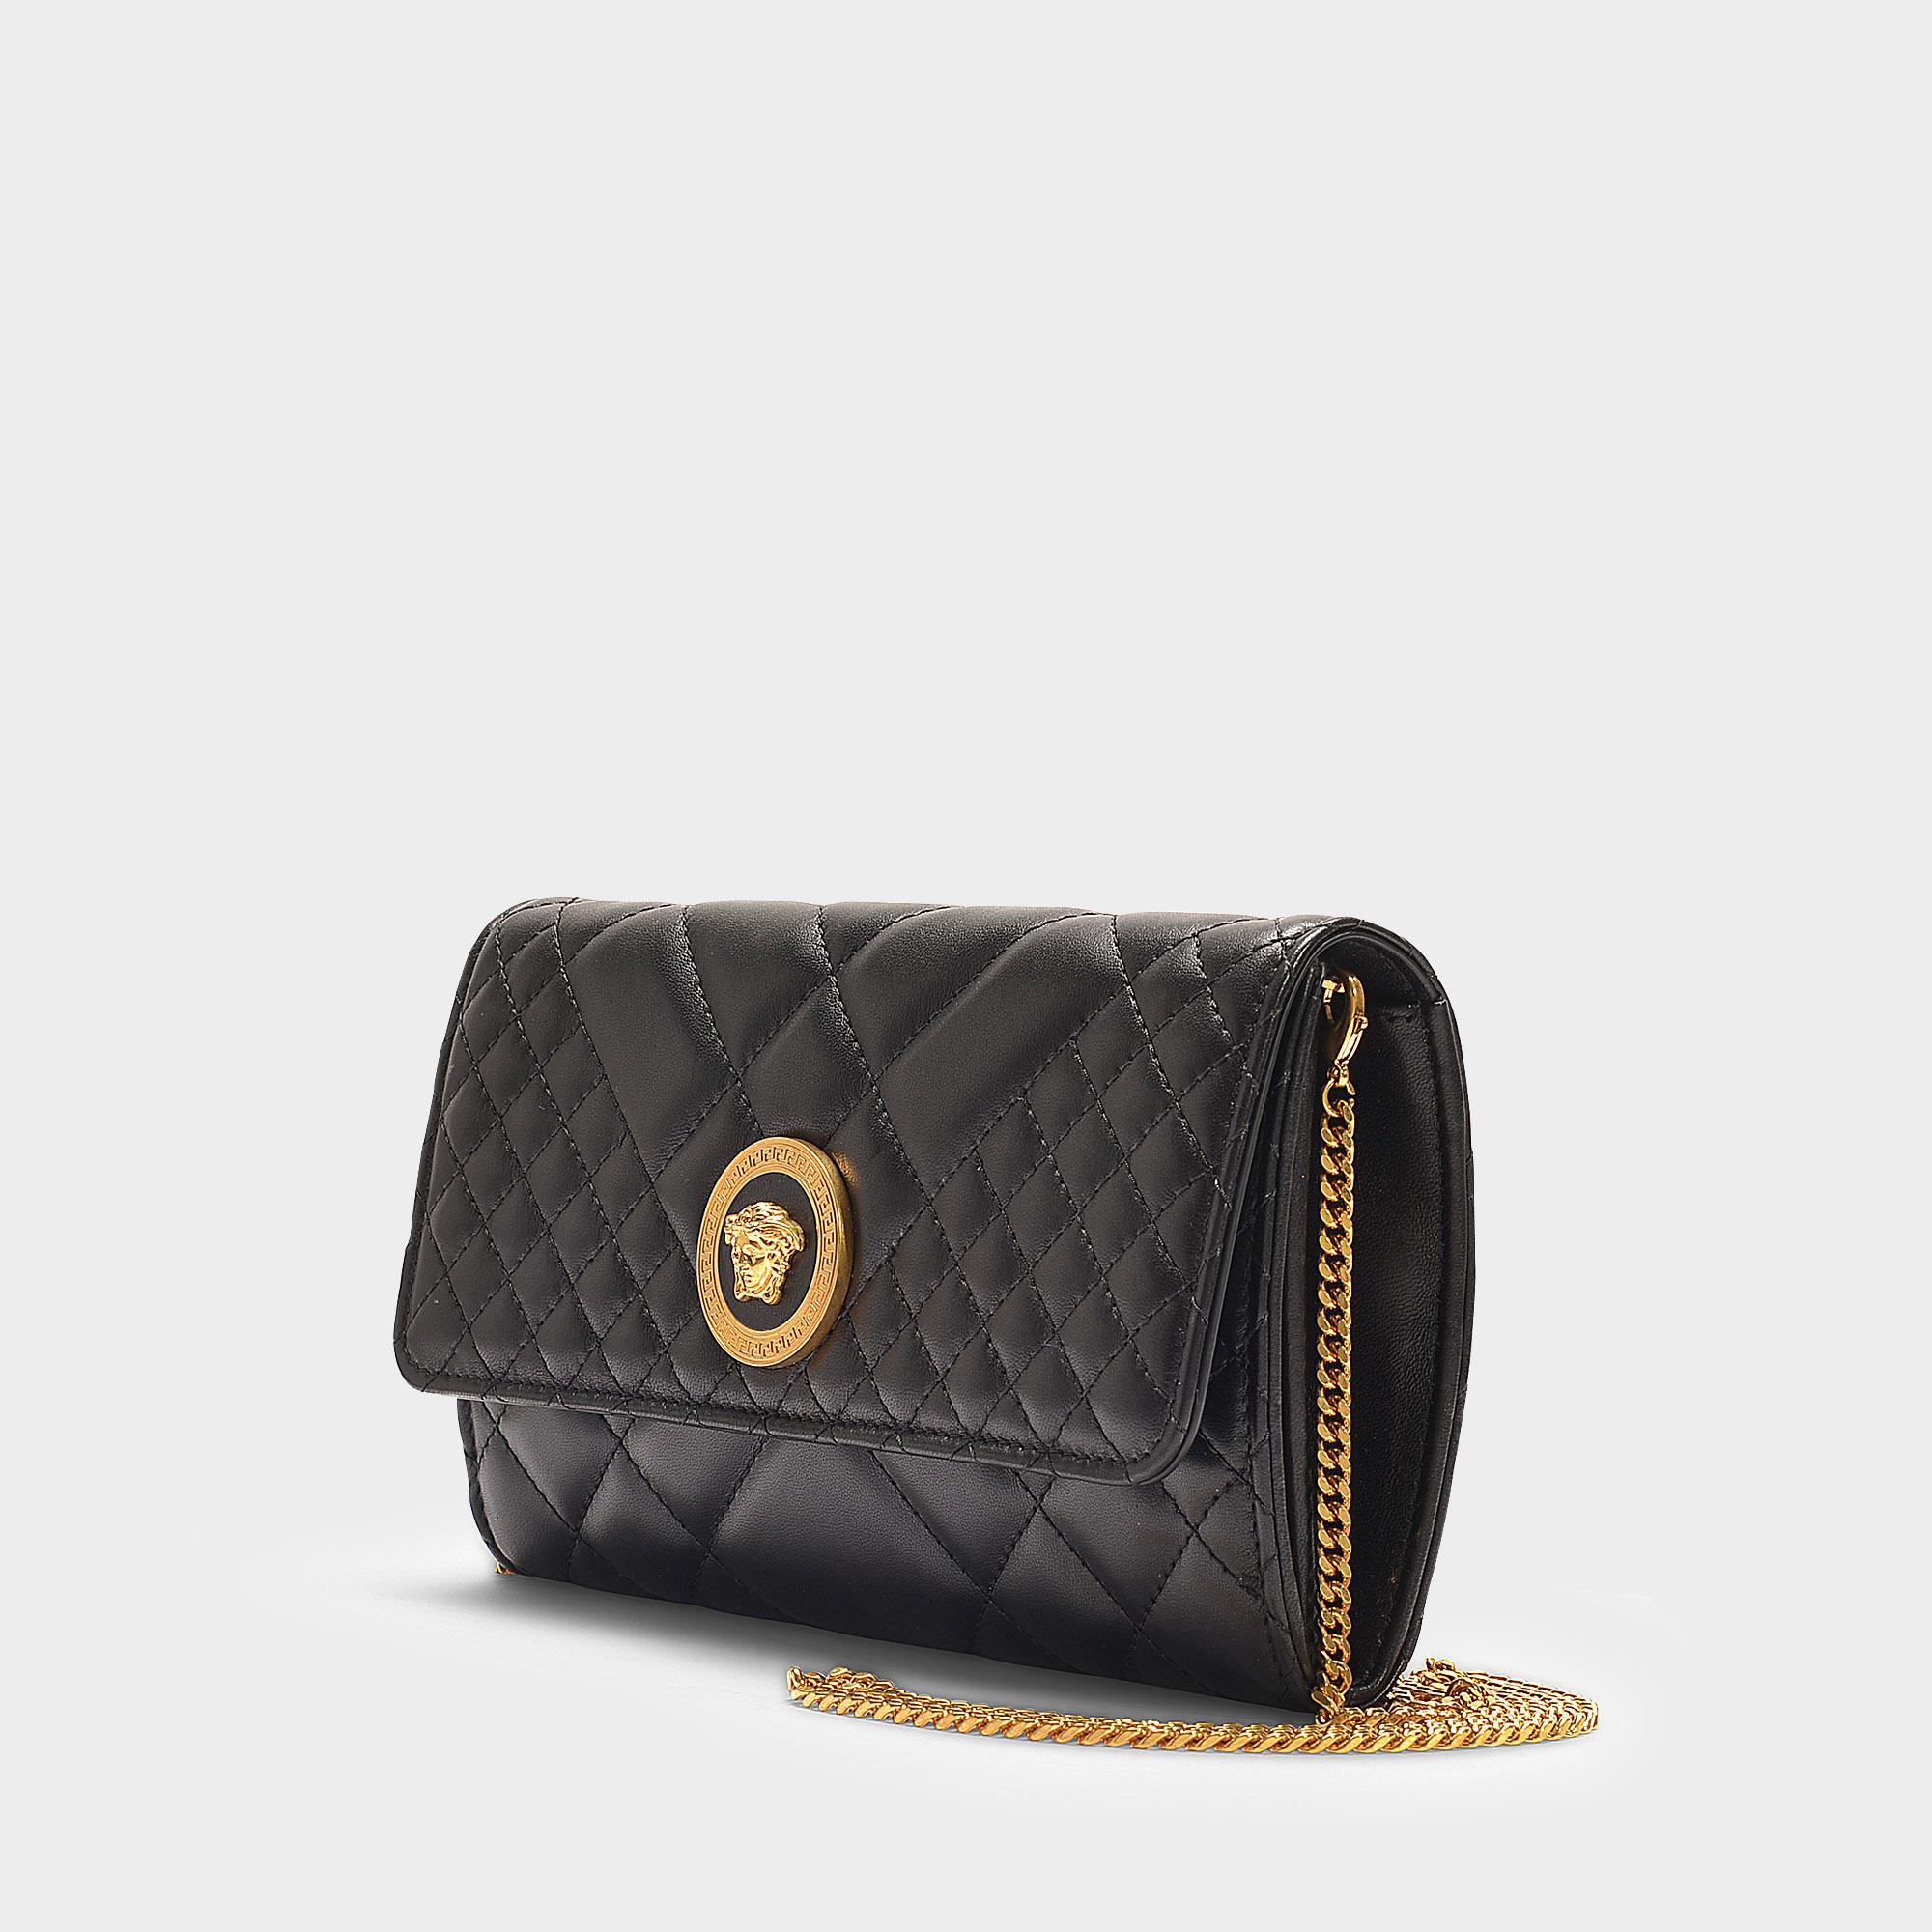 Versace Medusa Evening Bag In Black